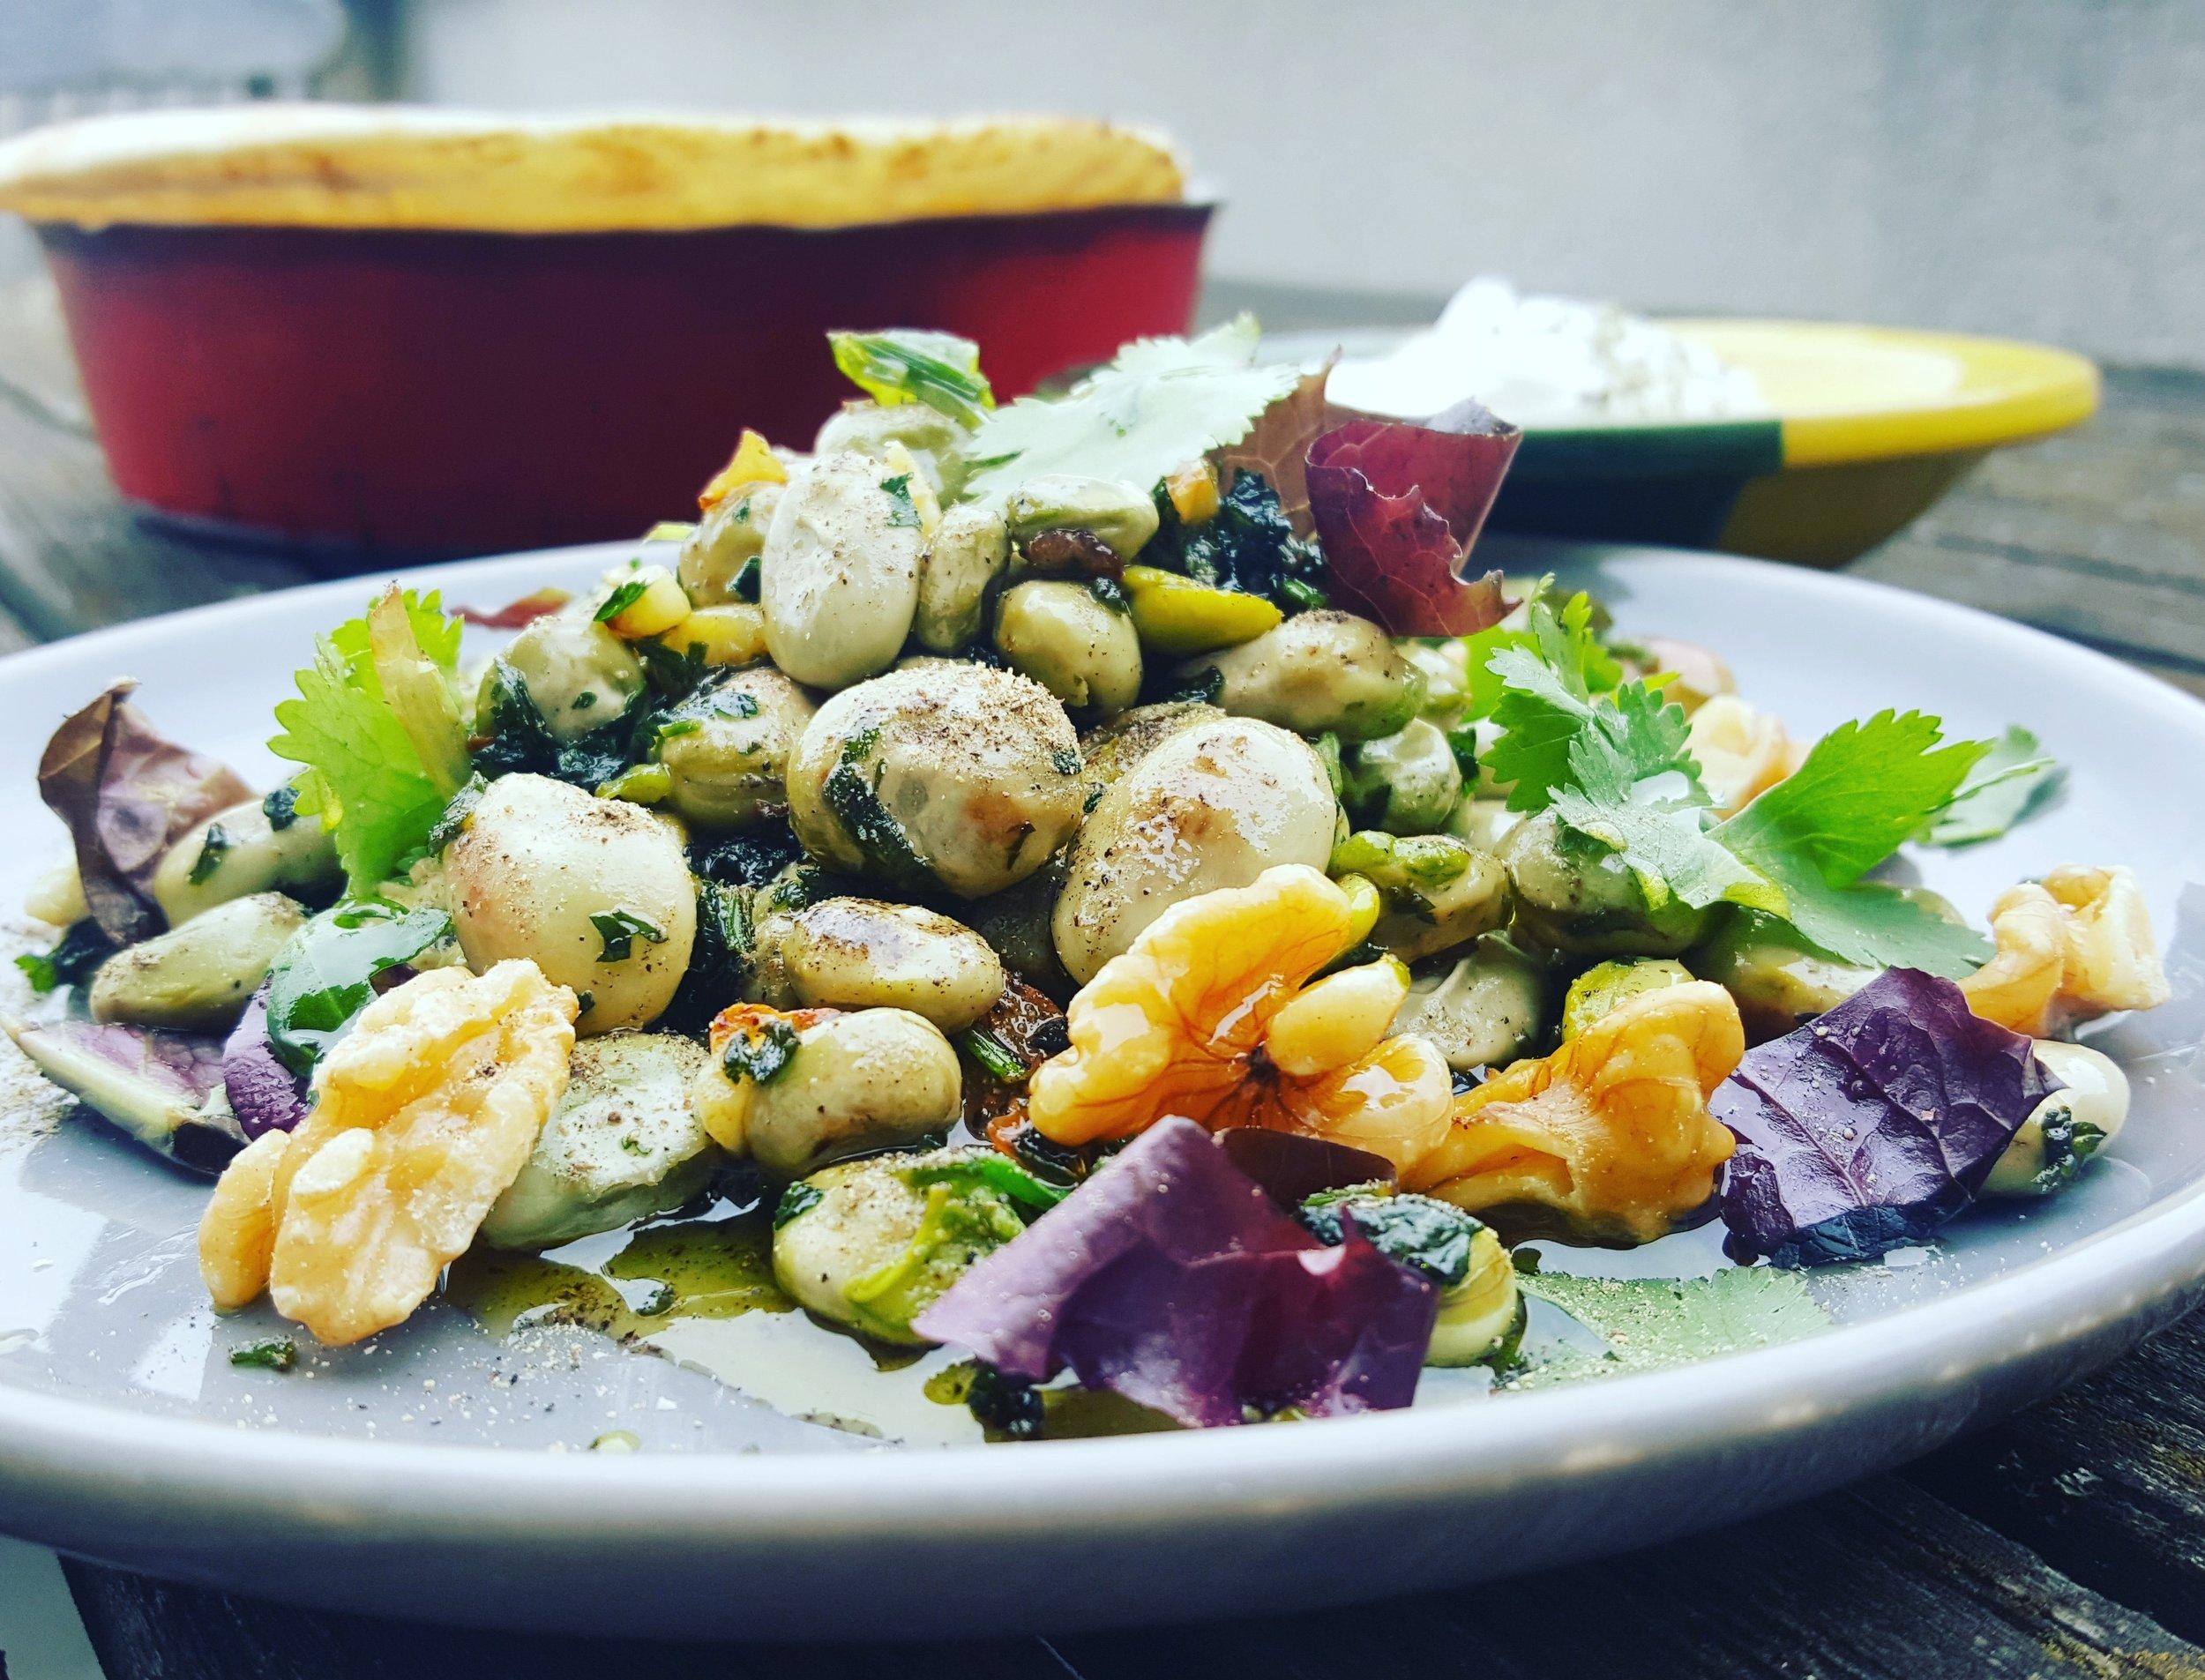 Photo by  Chef Emad  on  Unsplash